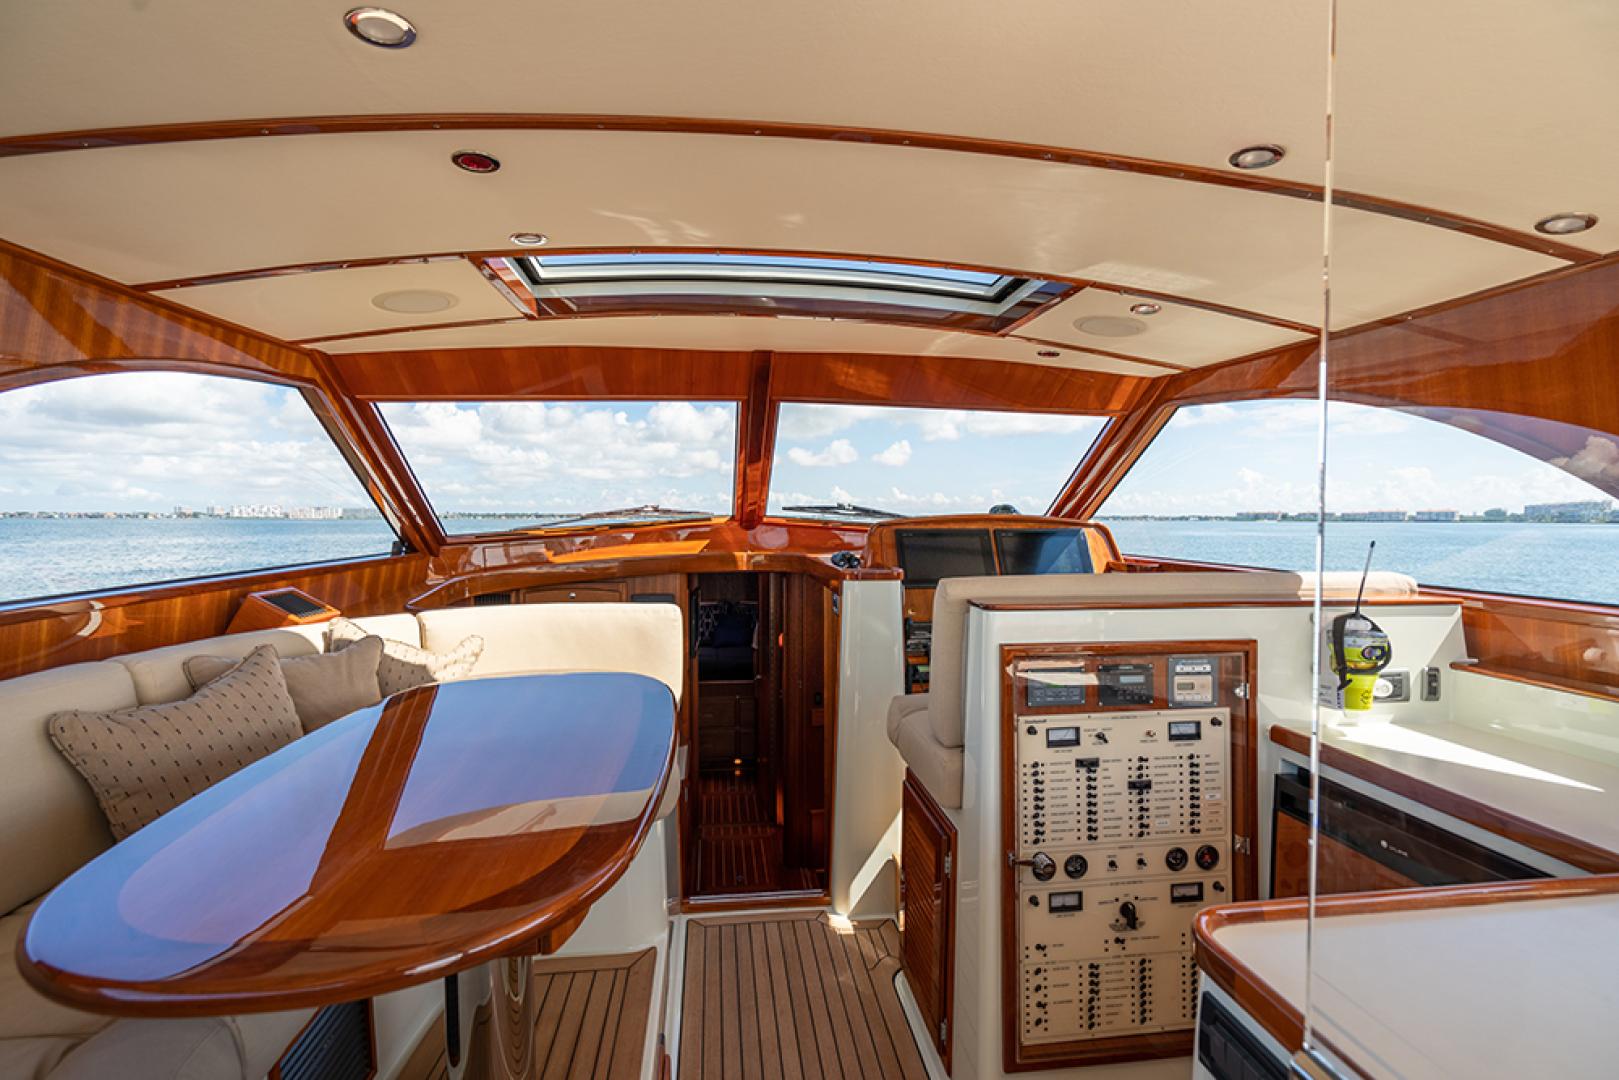 San Juan-SJ48 Express 2006 FEARLESS Saint Petersburg-Florida-United States-Salon/helm area view 3-1498299 | Thumbnail